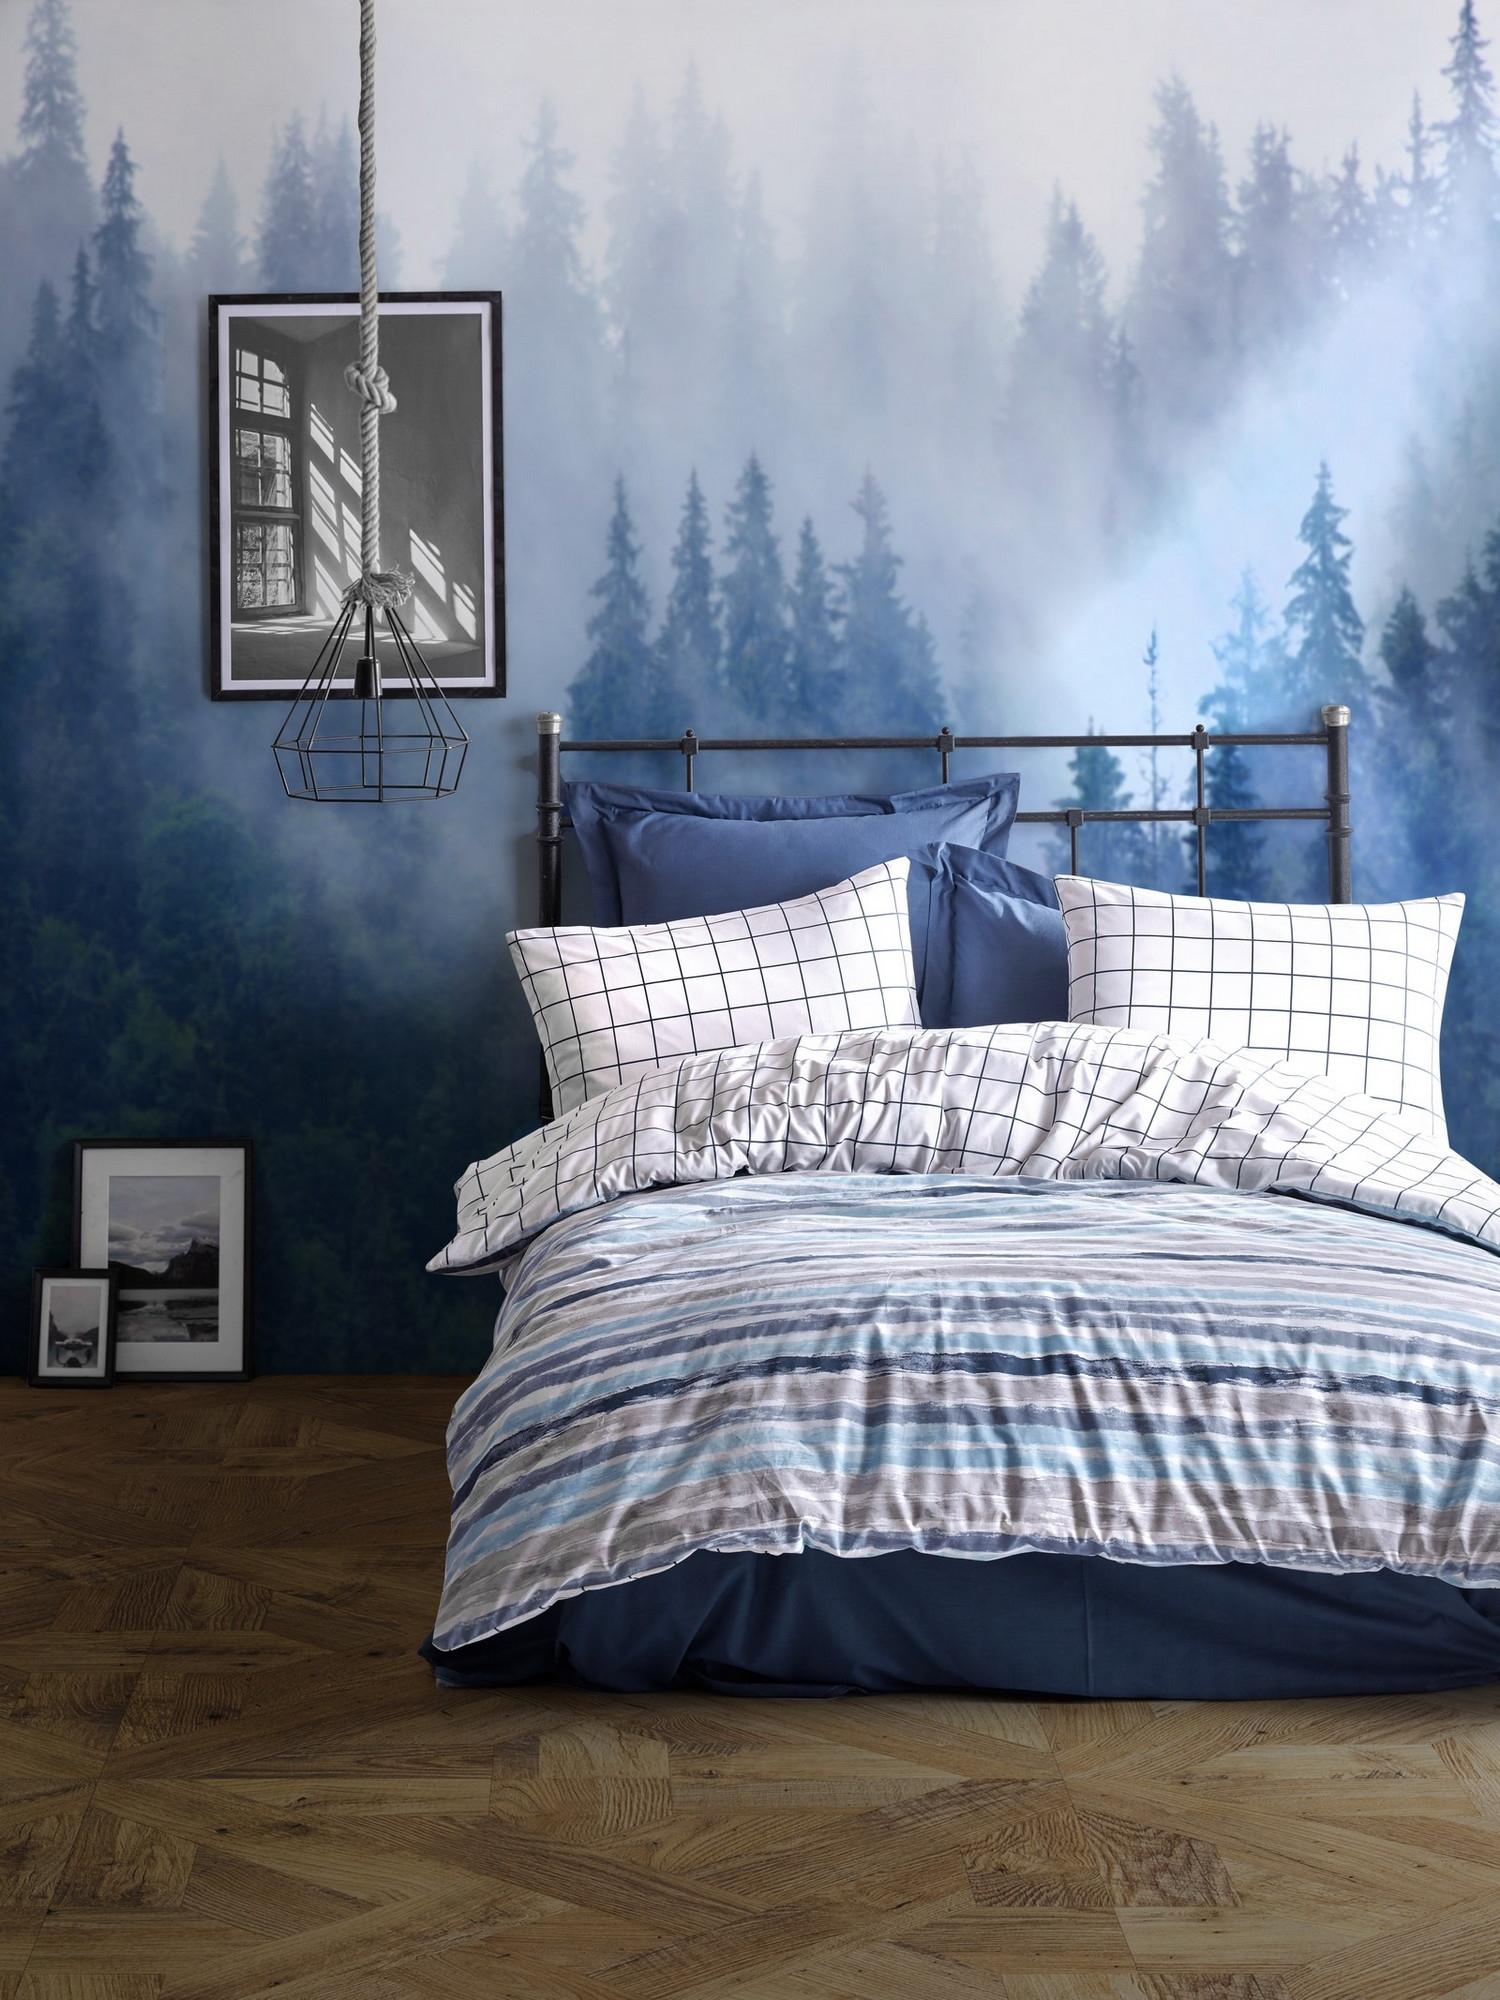 Lenjerie de pat din bumbac Ranforce, Grace Albastru / Alb, 200 x 220 cm imagine 2021